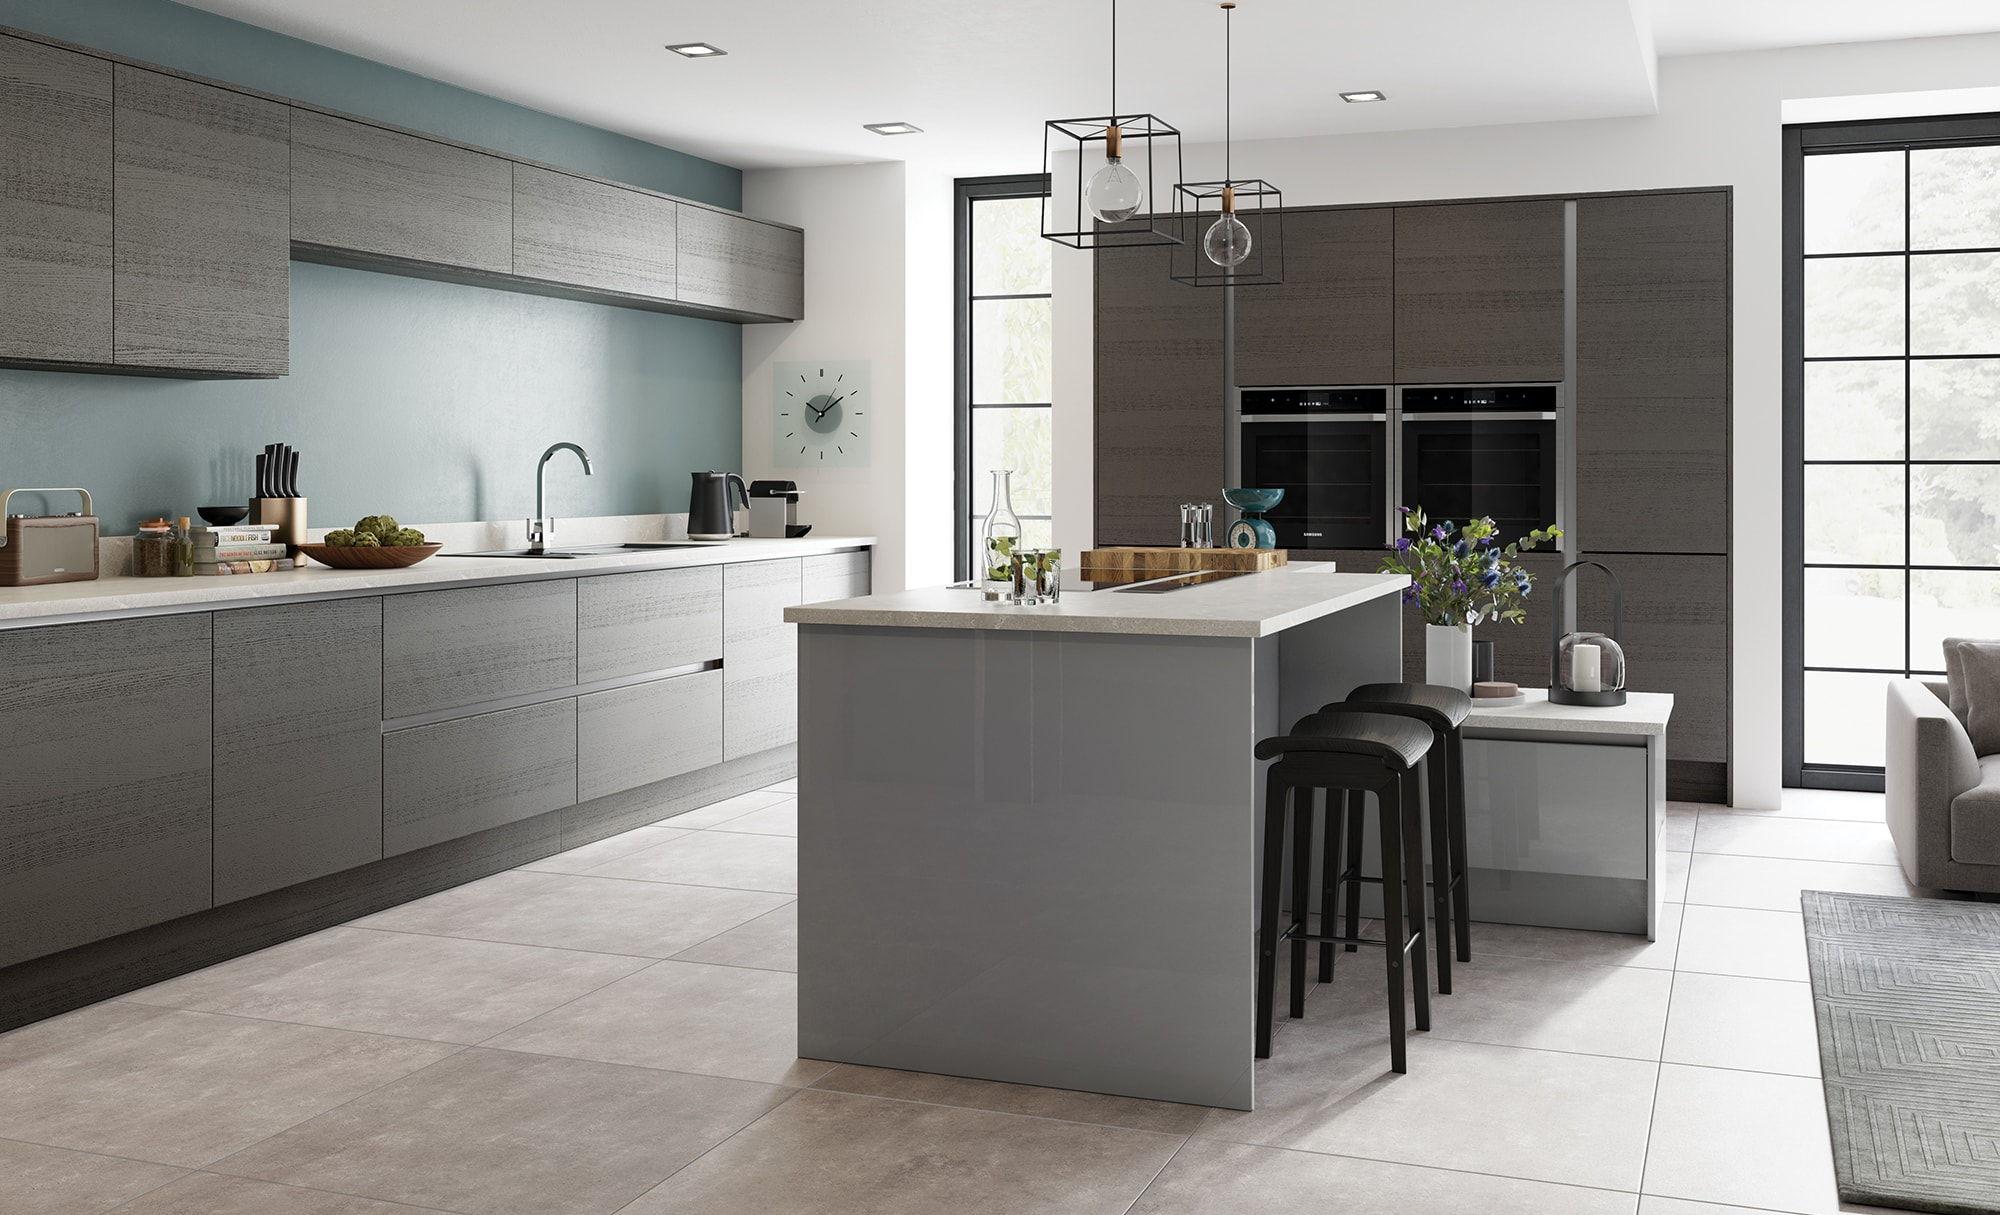 Modern Contemporary Tavola Anthracite, Zola Gloss Handleless Dust Grey Kitchen - Kitchen Design - Alan Kelly Kitchens - Waterford